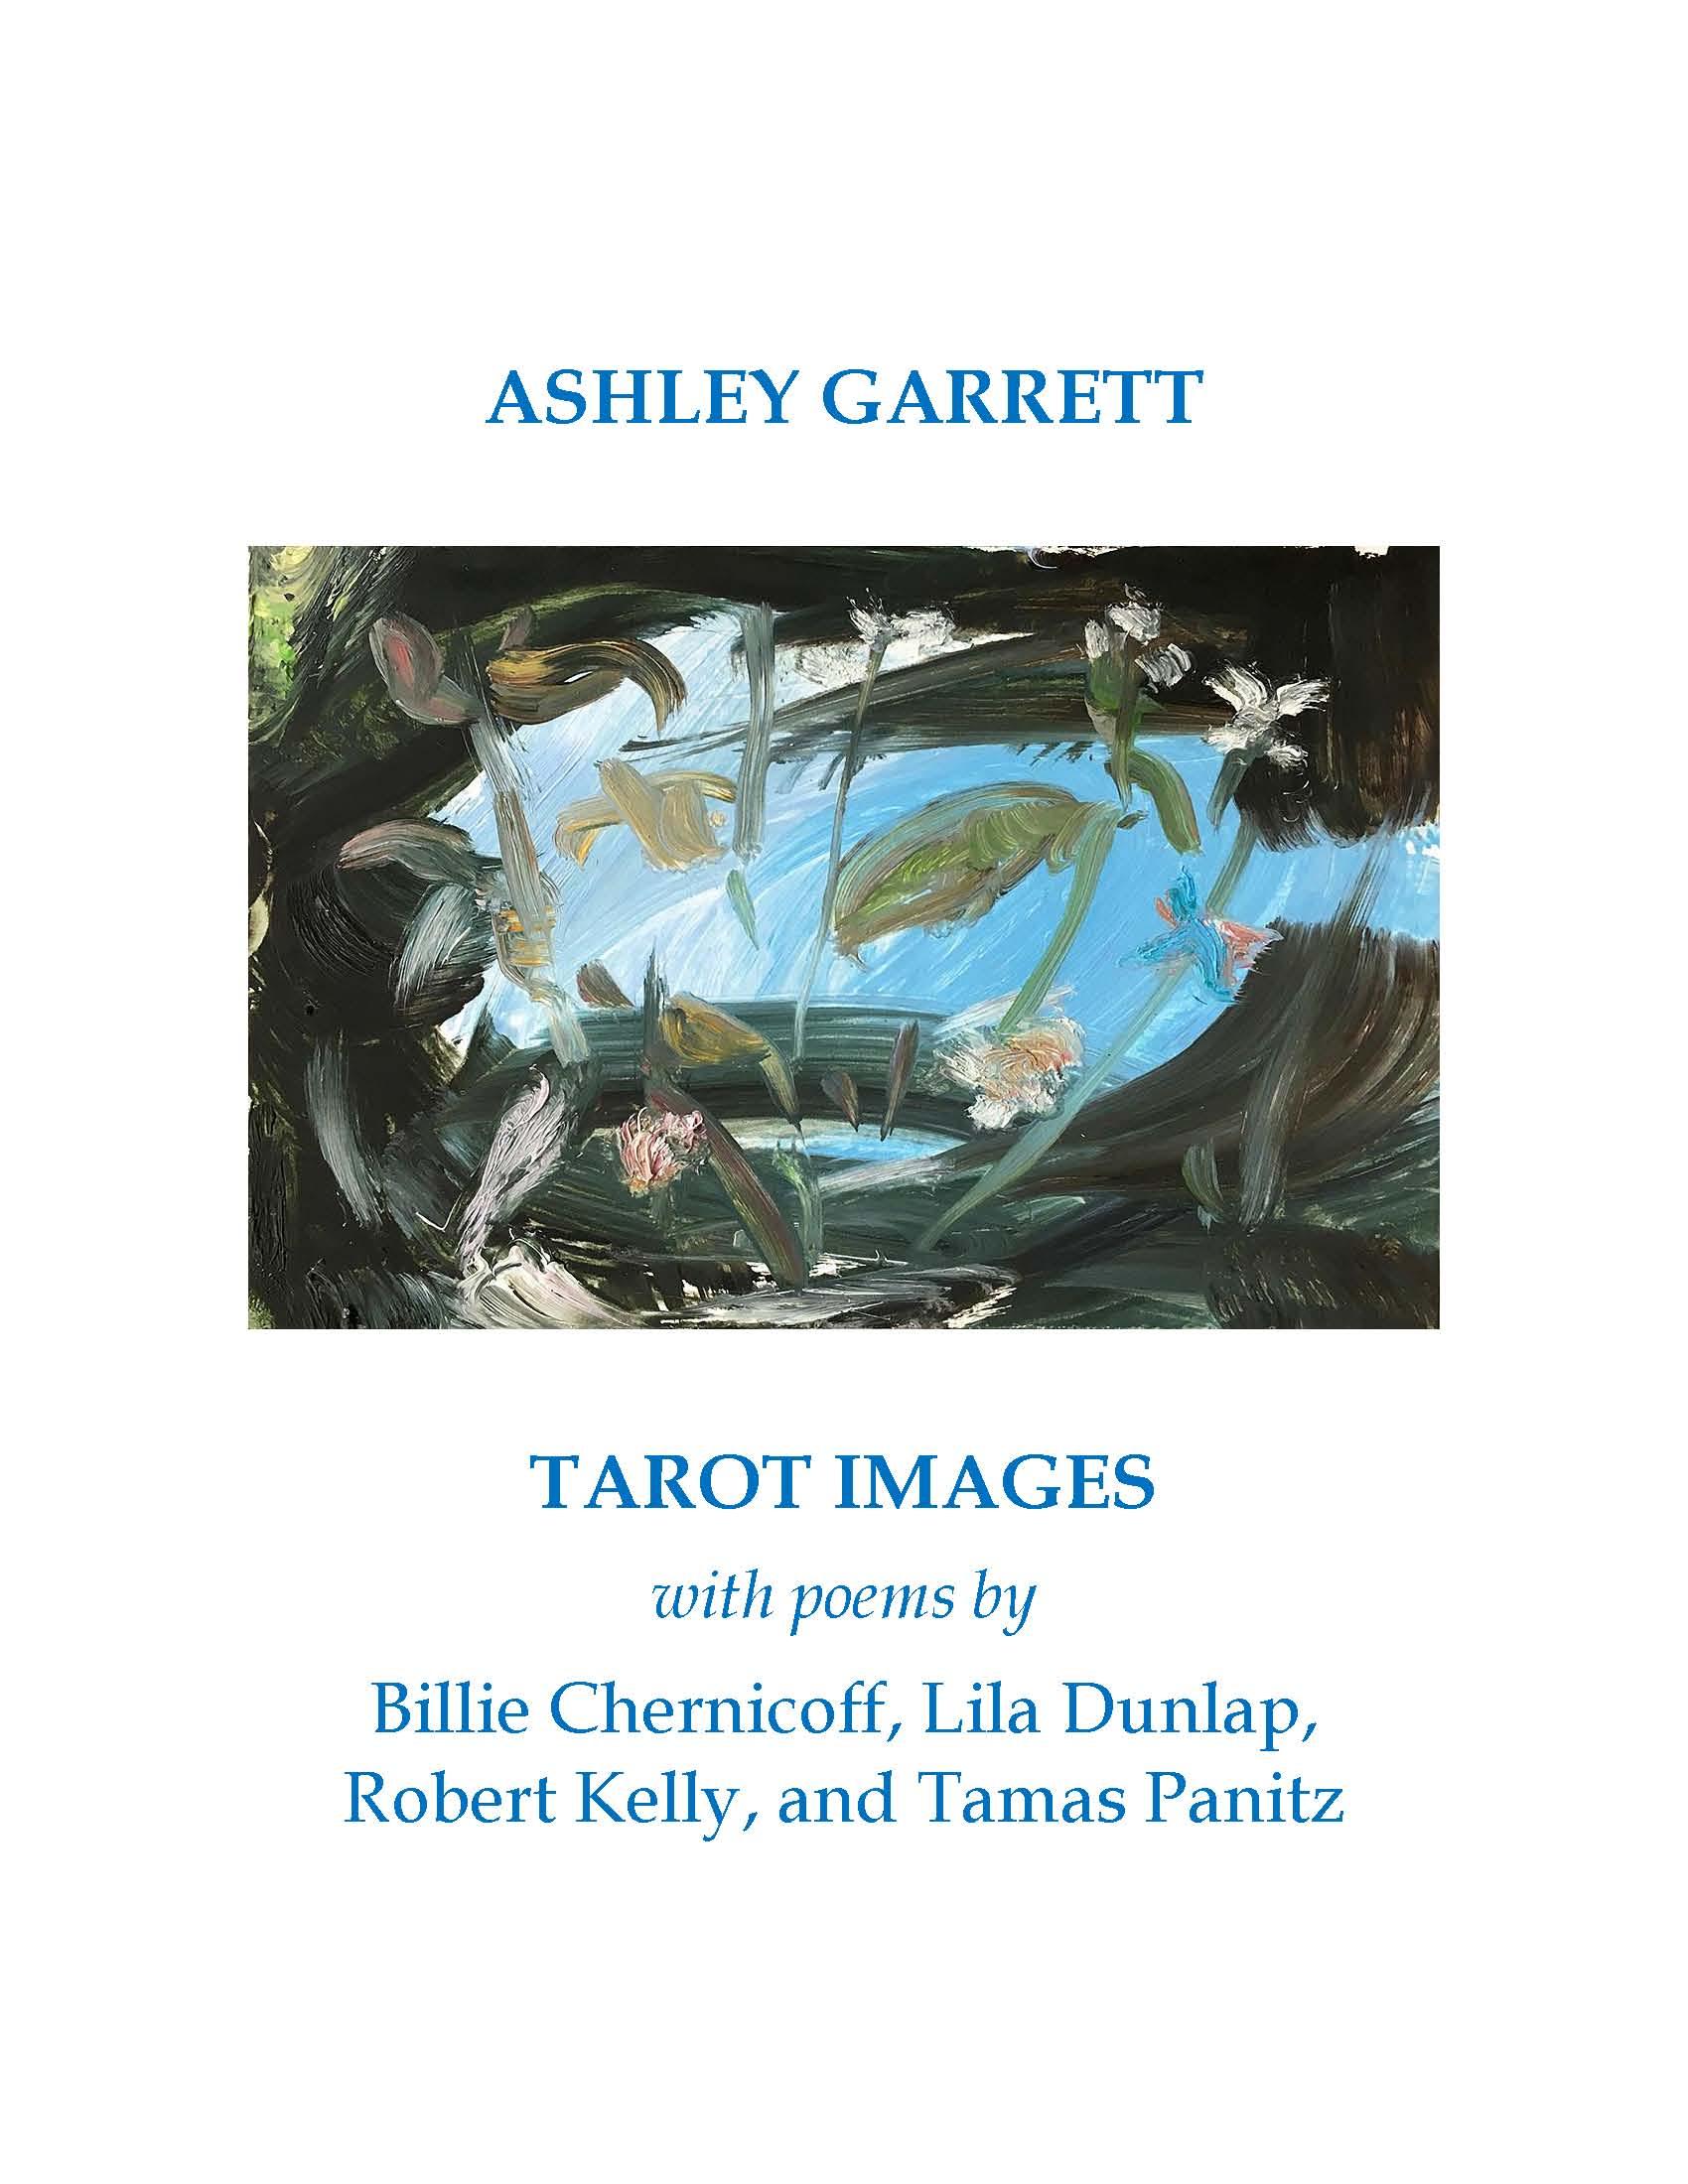 Ashley Garrett: Tarot Images